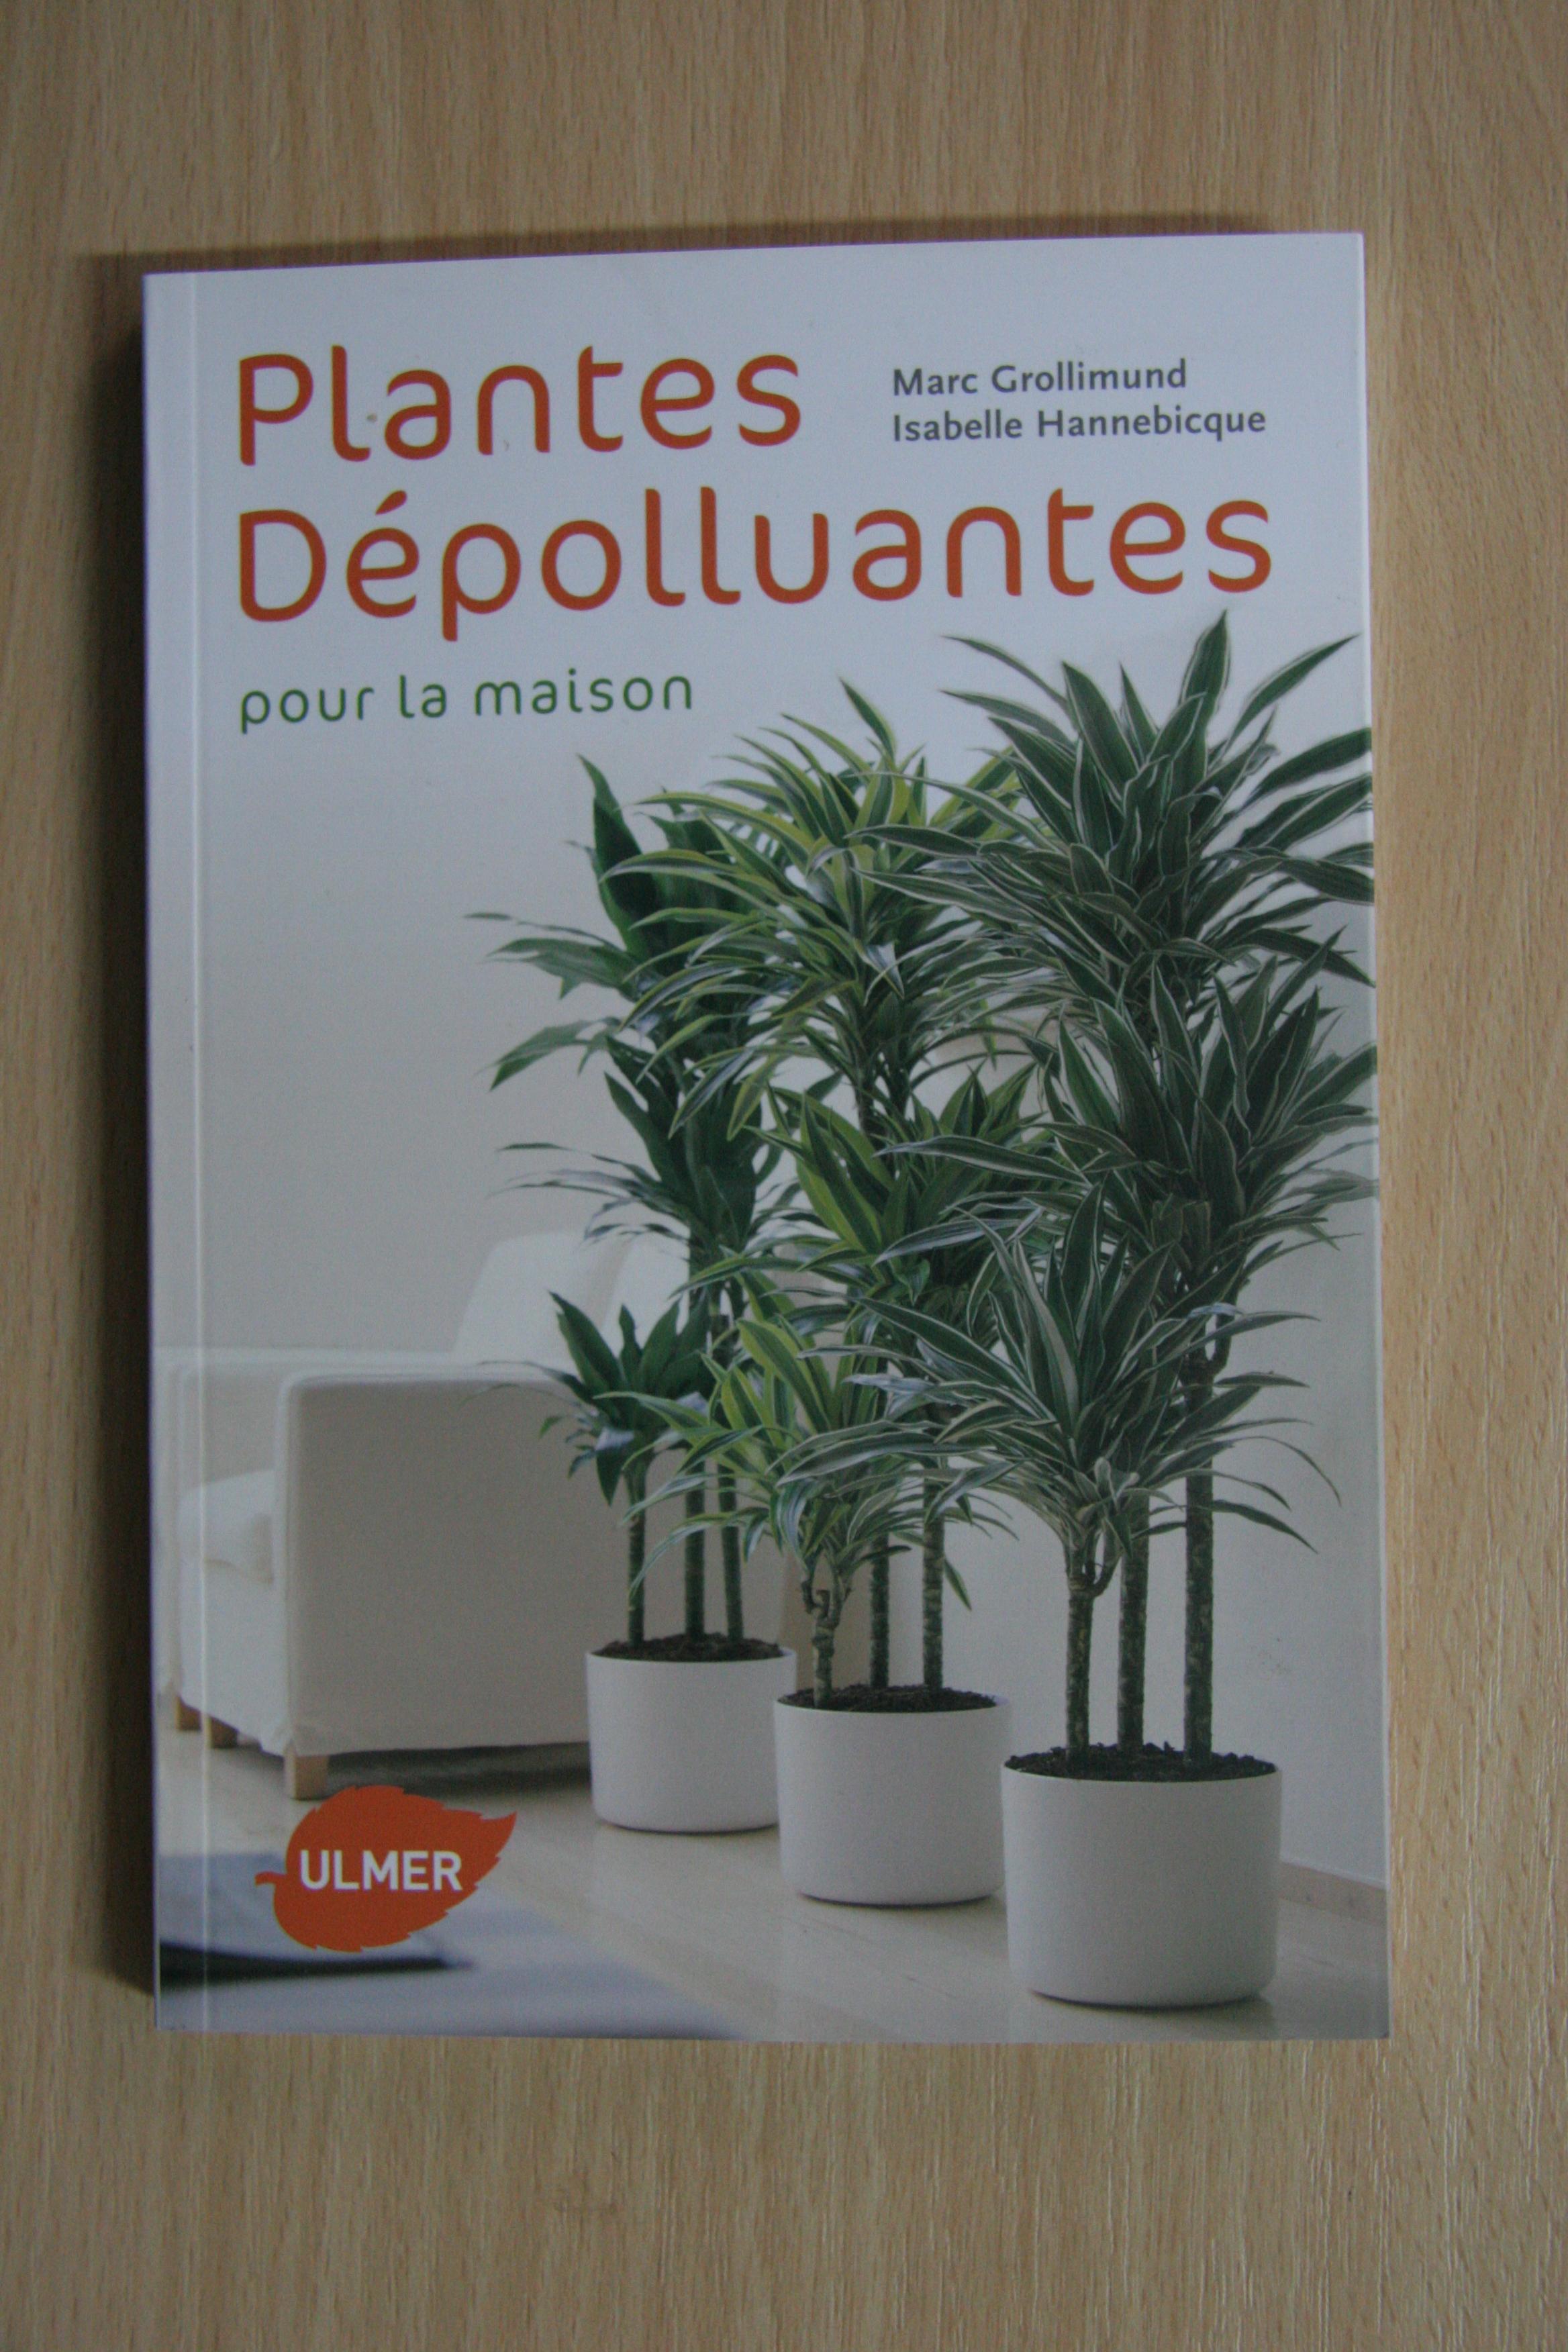 Plante verte interieur depolluante 28 images plante of Plantes depolluantes